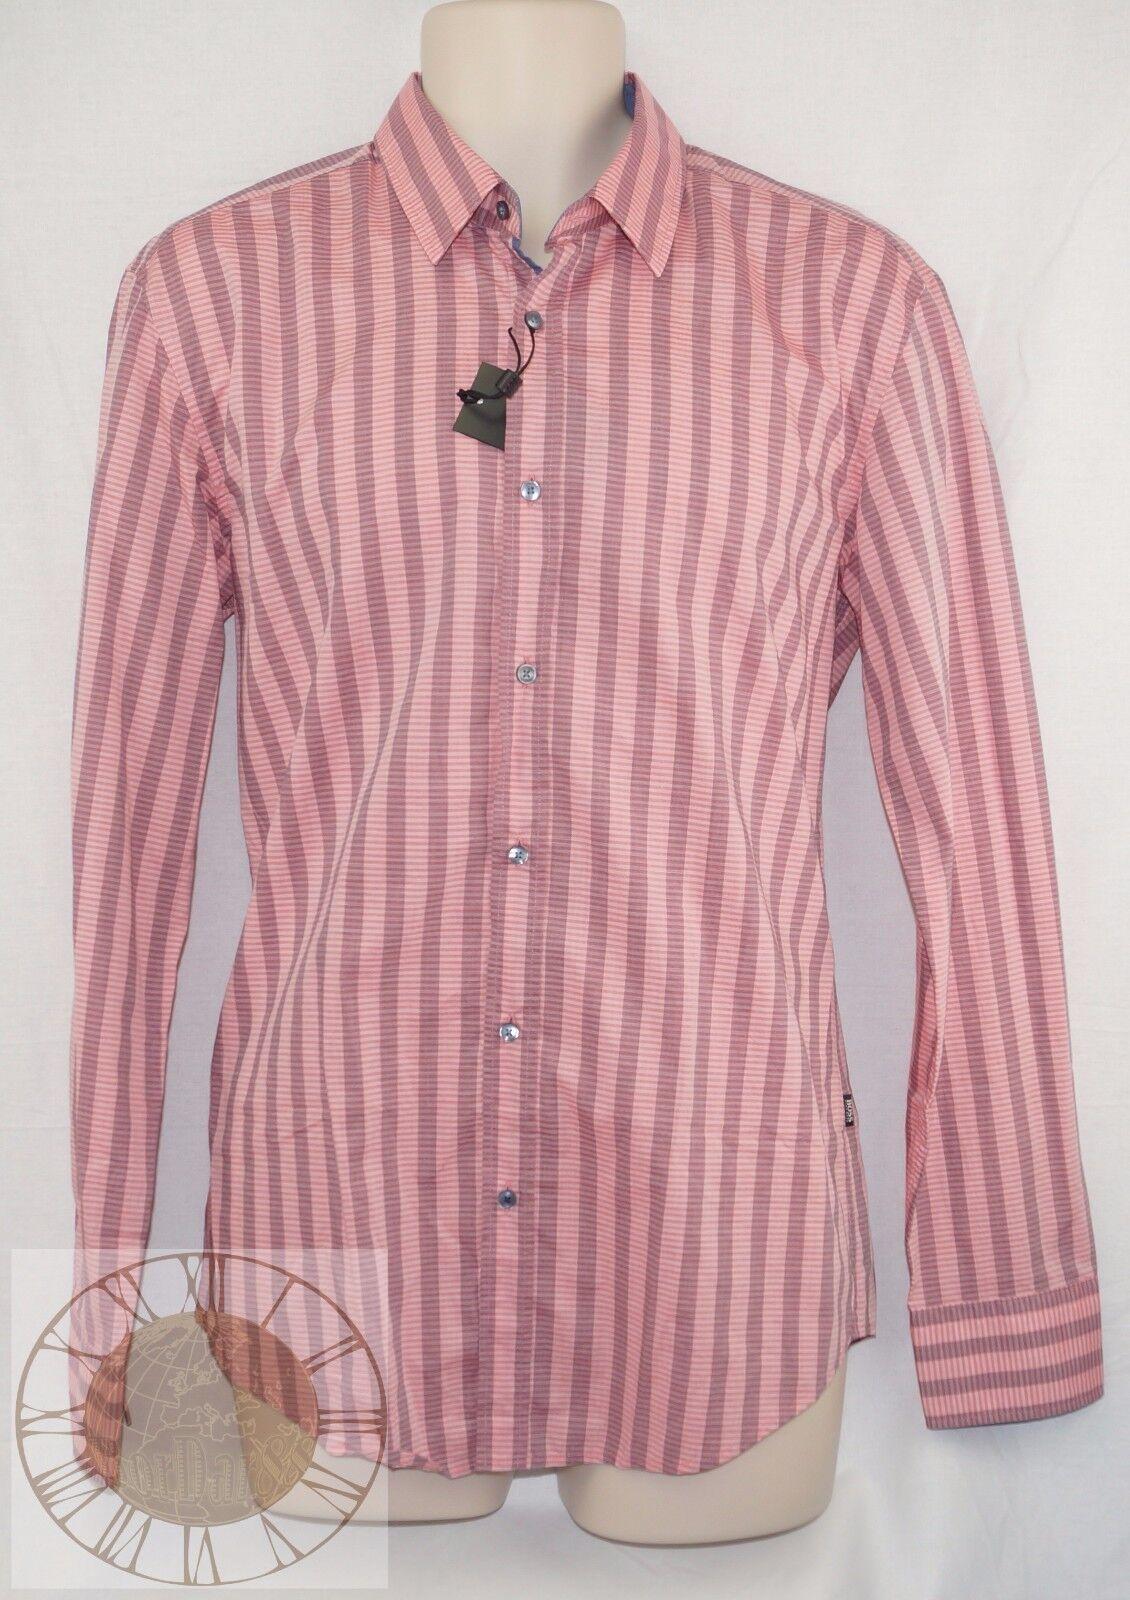 Hugo Boss  Ronny  Mens Striped Button Down Shirt Size 2XL (50259136 645), NWT